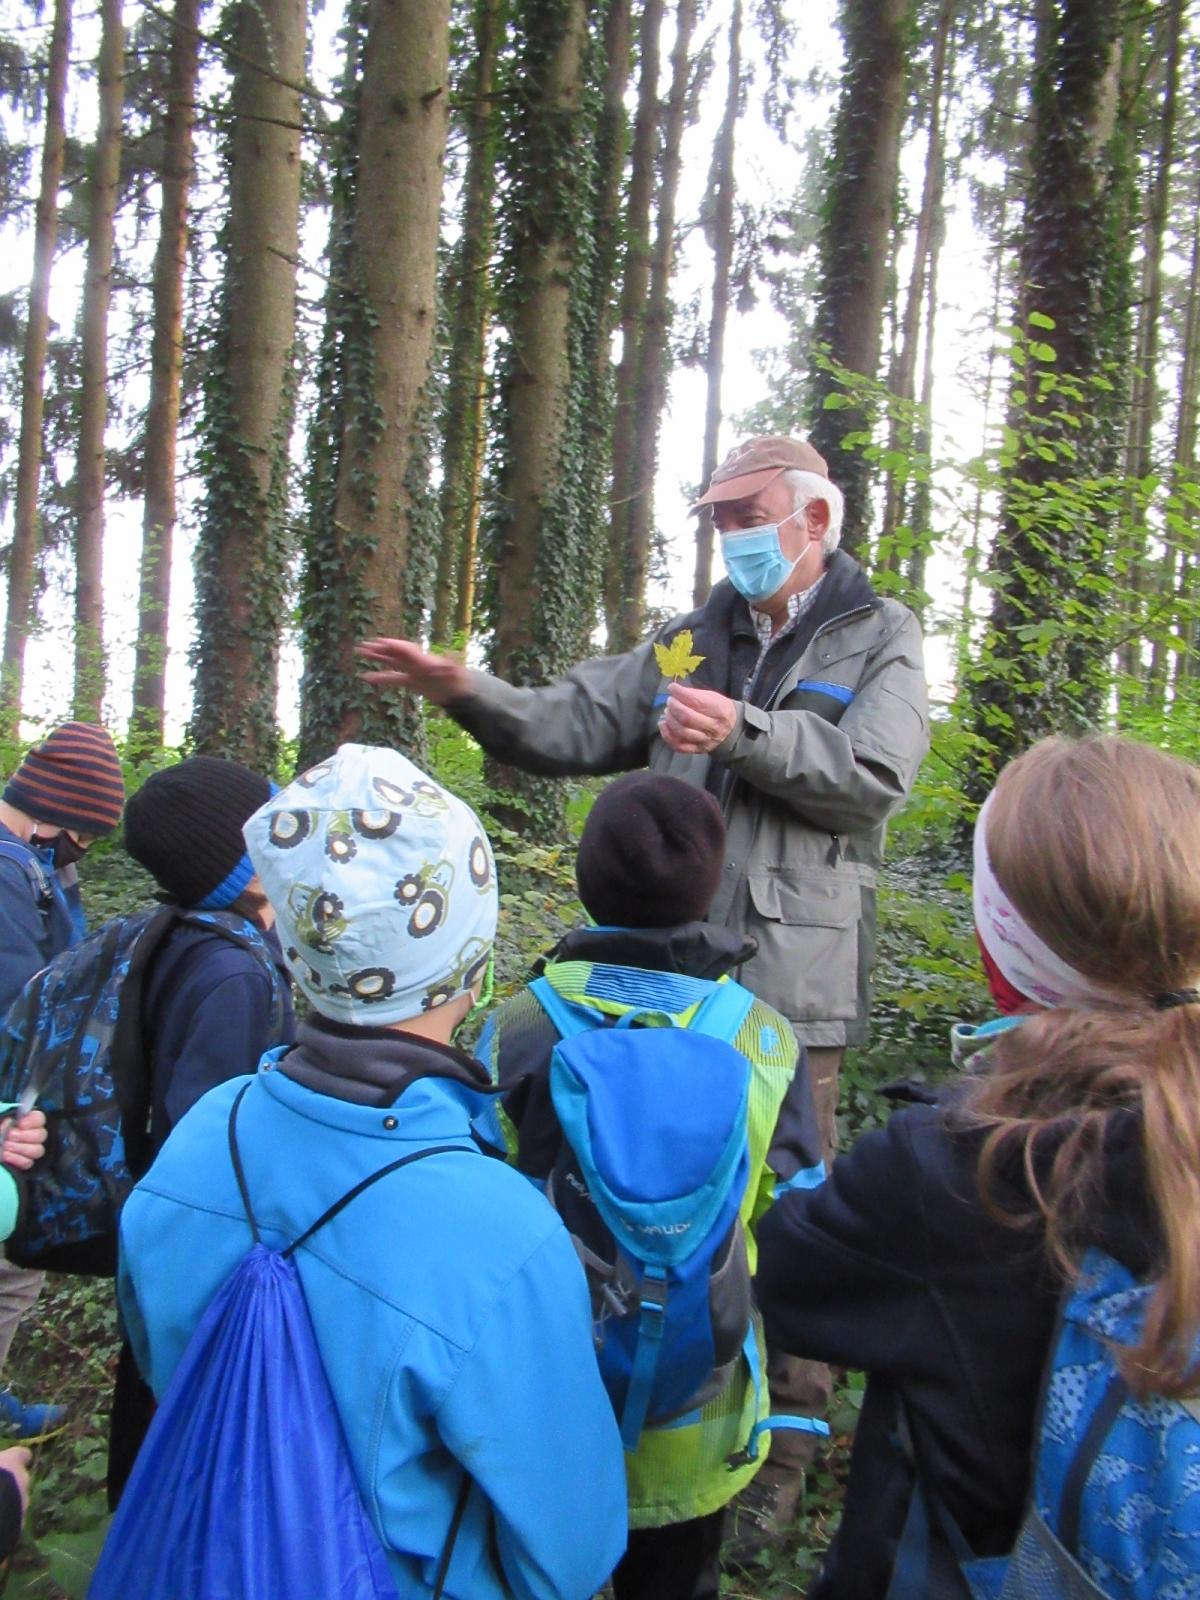 Unterrichtsgang der Klasse 3a in den Wald